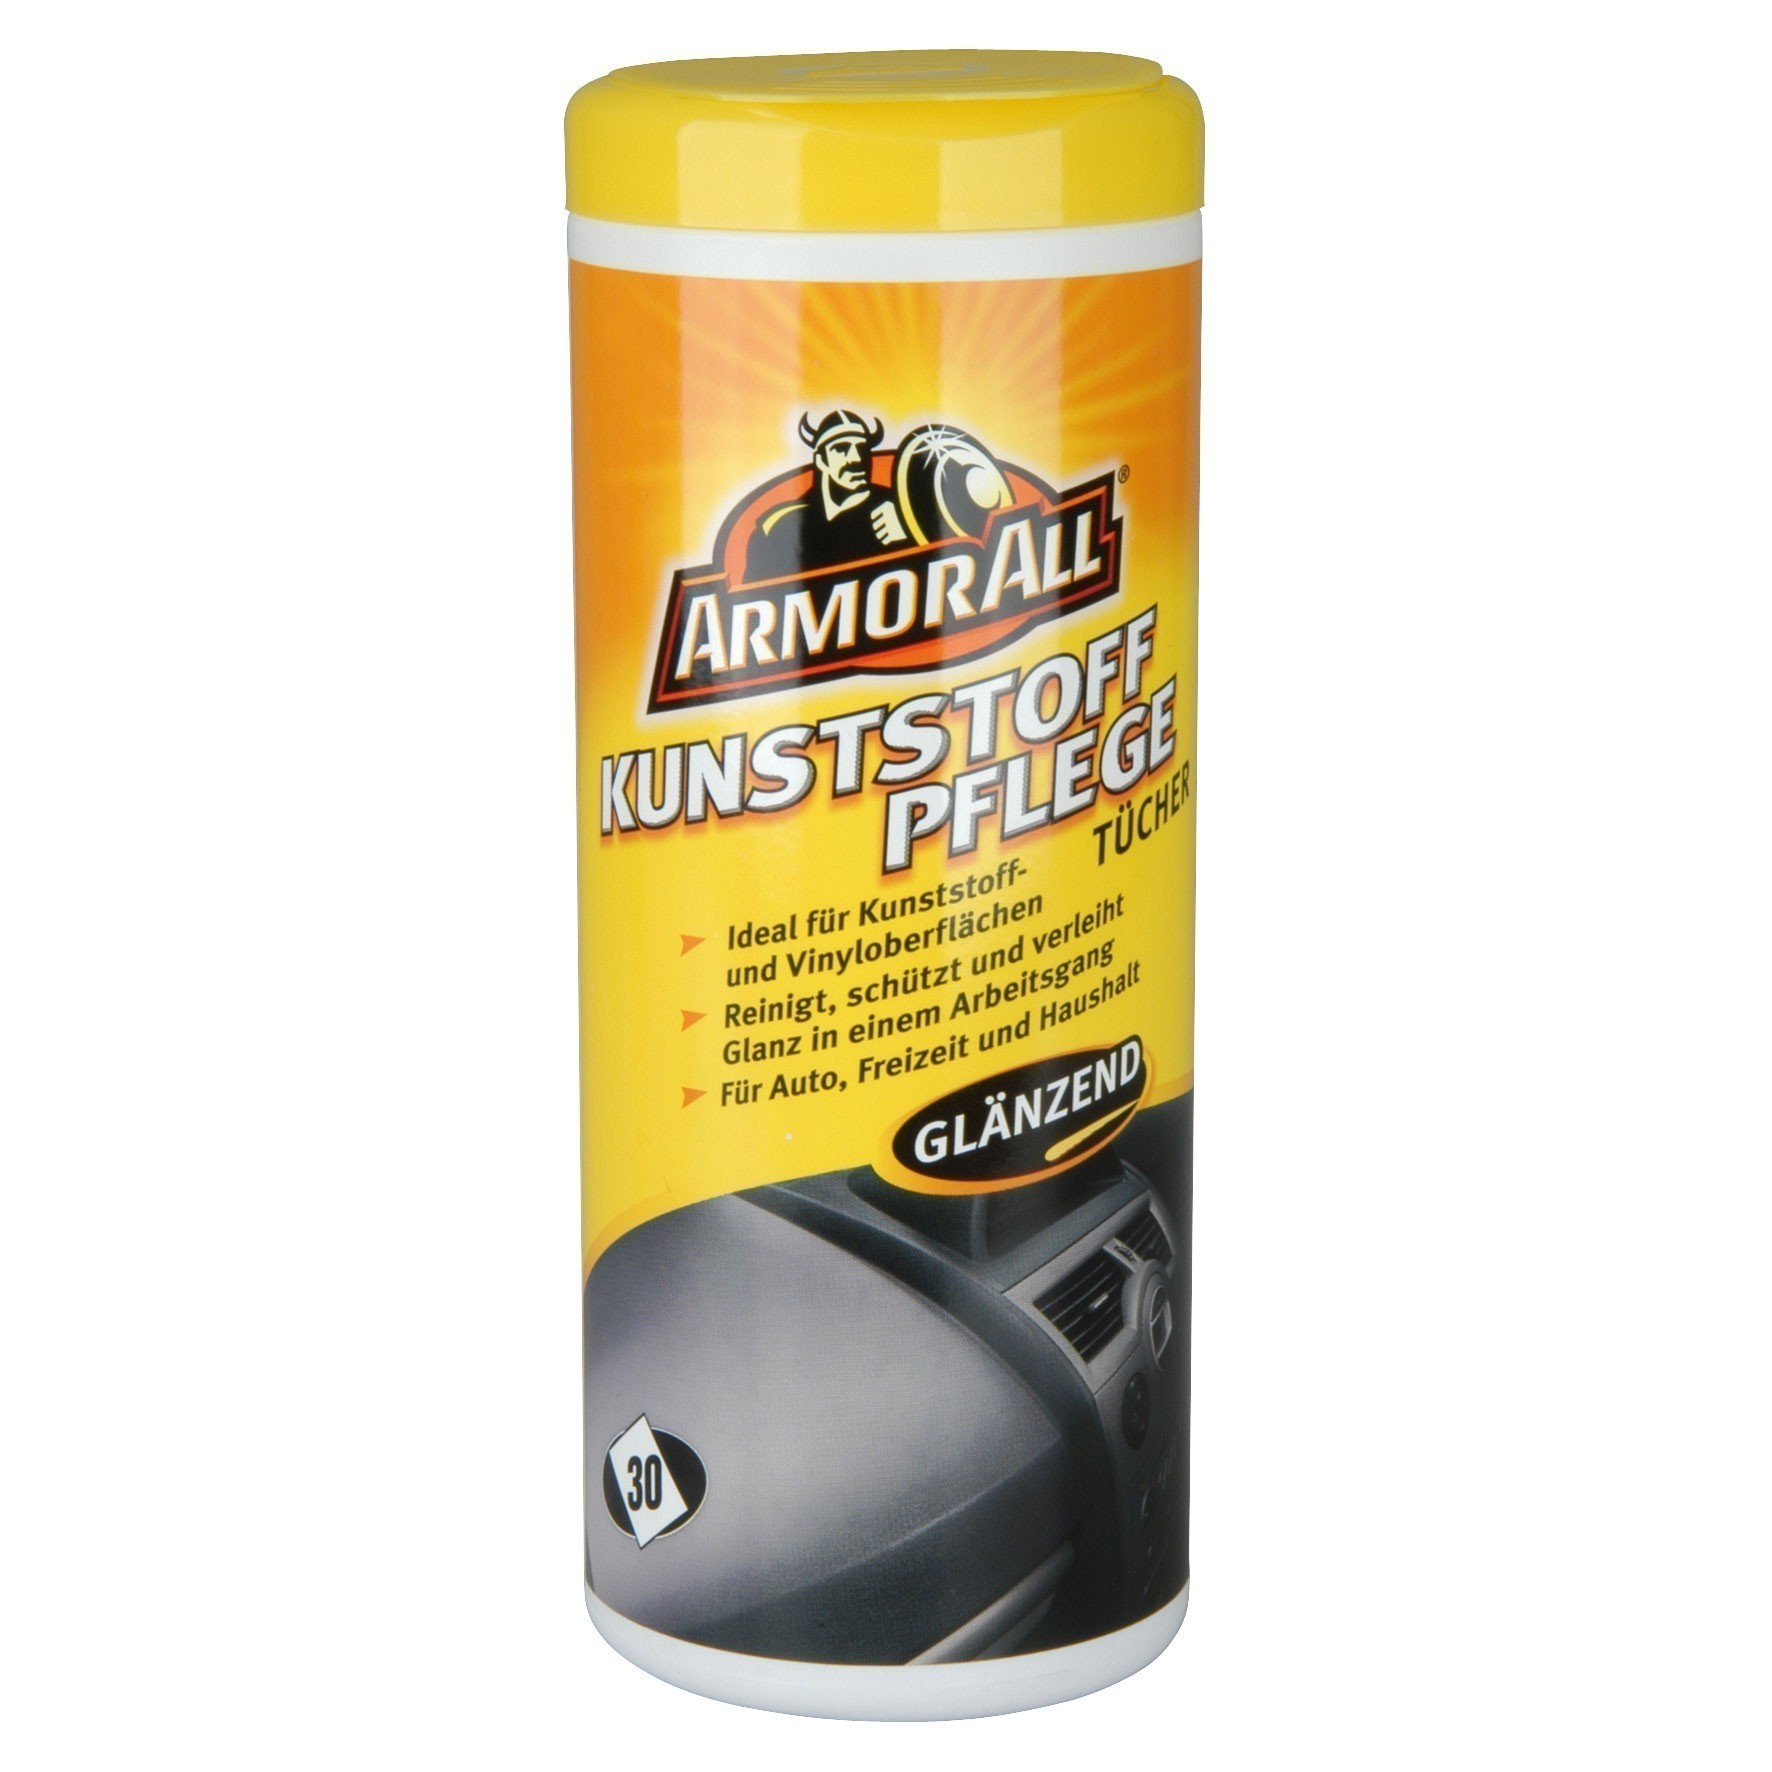 ArmorAll Kunststoffpflege-Tücher 25 Stück Bild 1